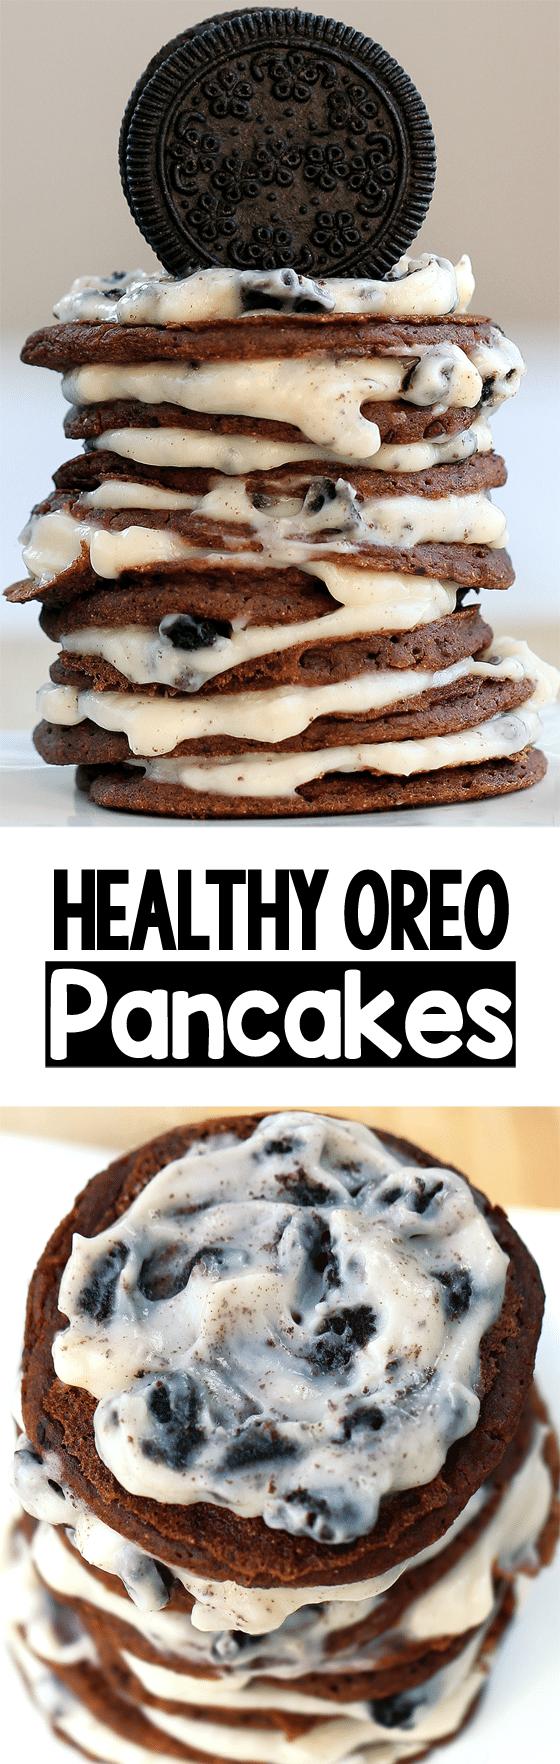 Secretly Healthy Vegan Oreo Pancake Recipe